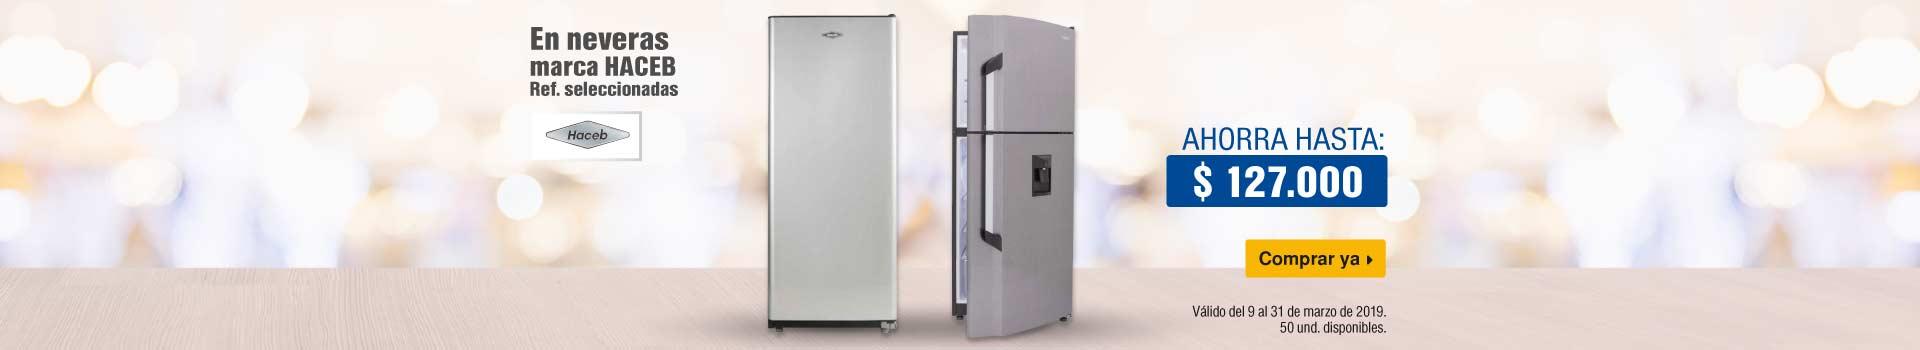 AK-KT-mayores-2-ELECT-BCAT-refrigeracion-HACEB-060319